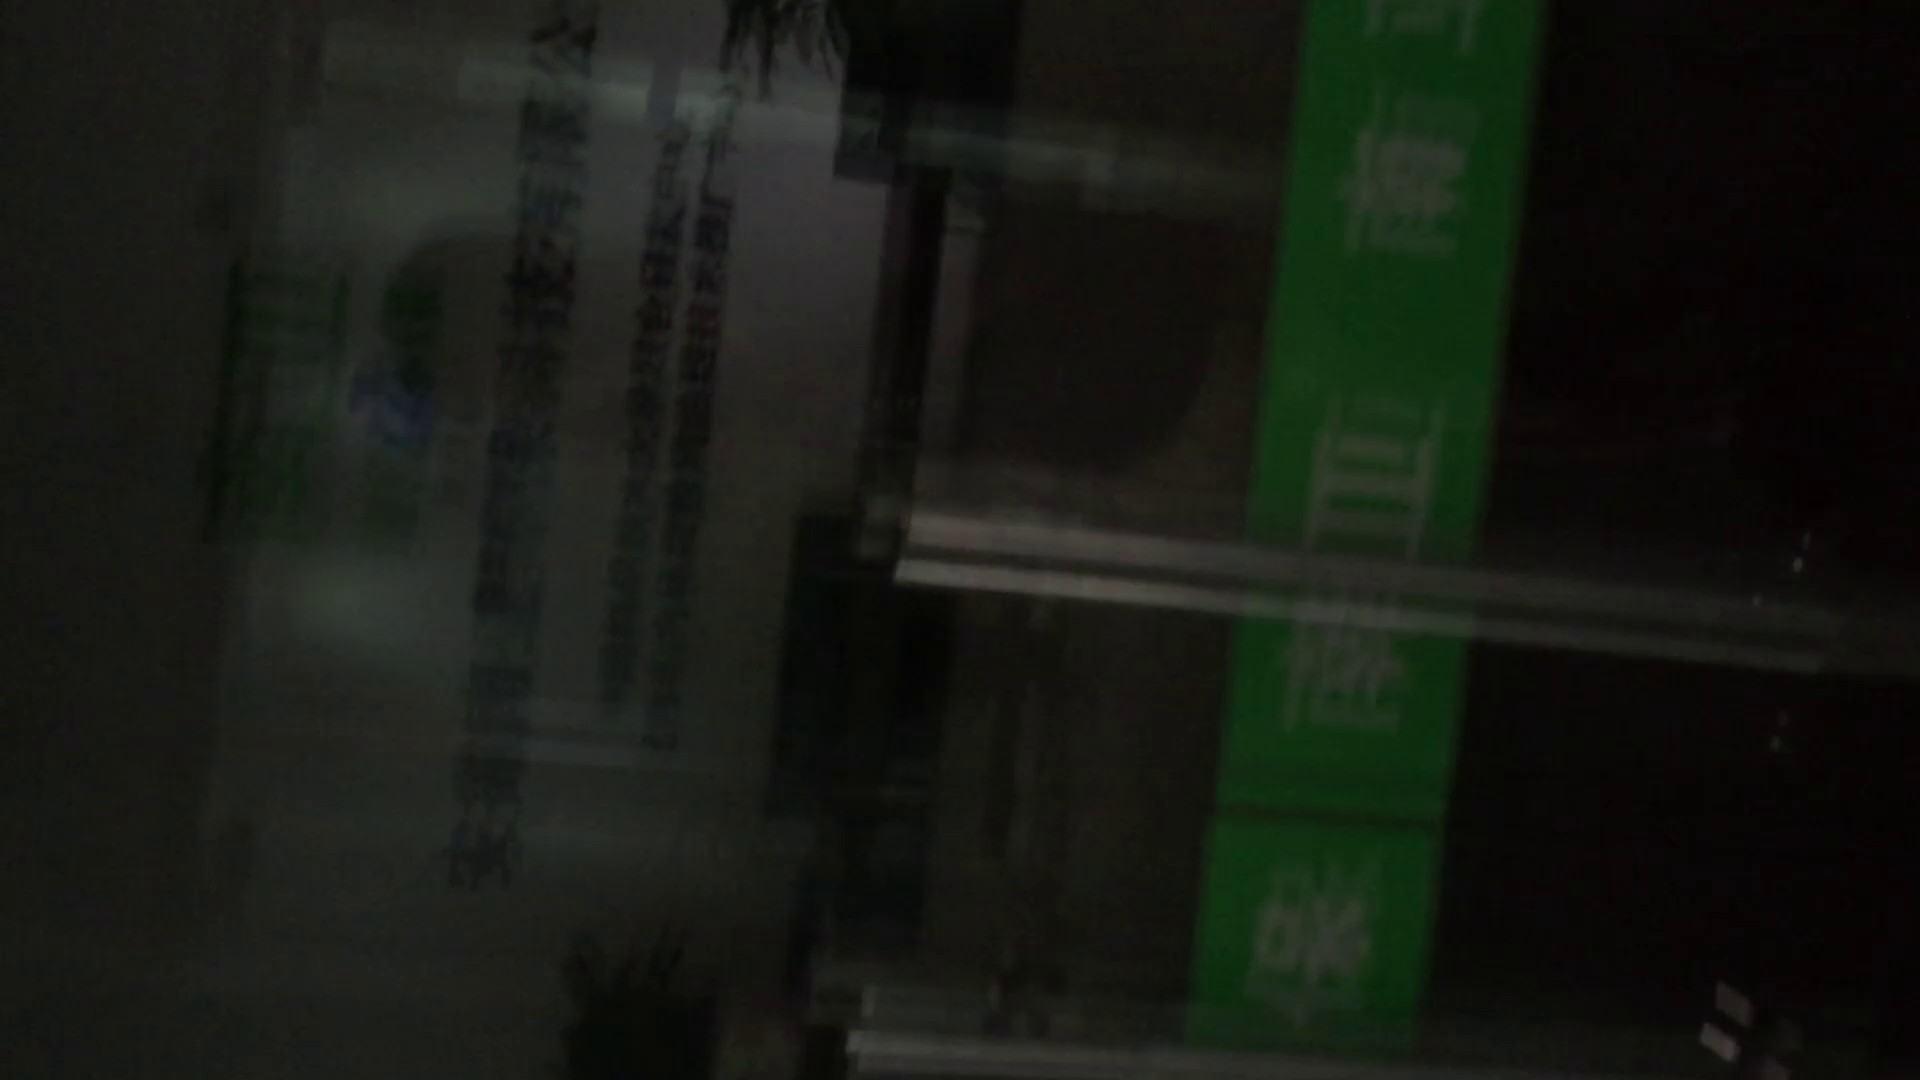 JD盗撮 美女の洗面所の秘密 Vol.74 OLの実態 盗撮ワレメ無修正動画無料 91pic 32